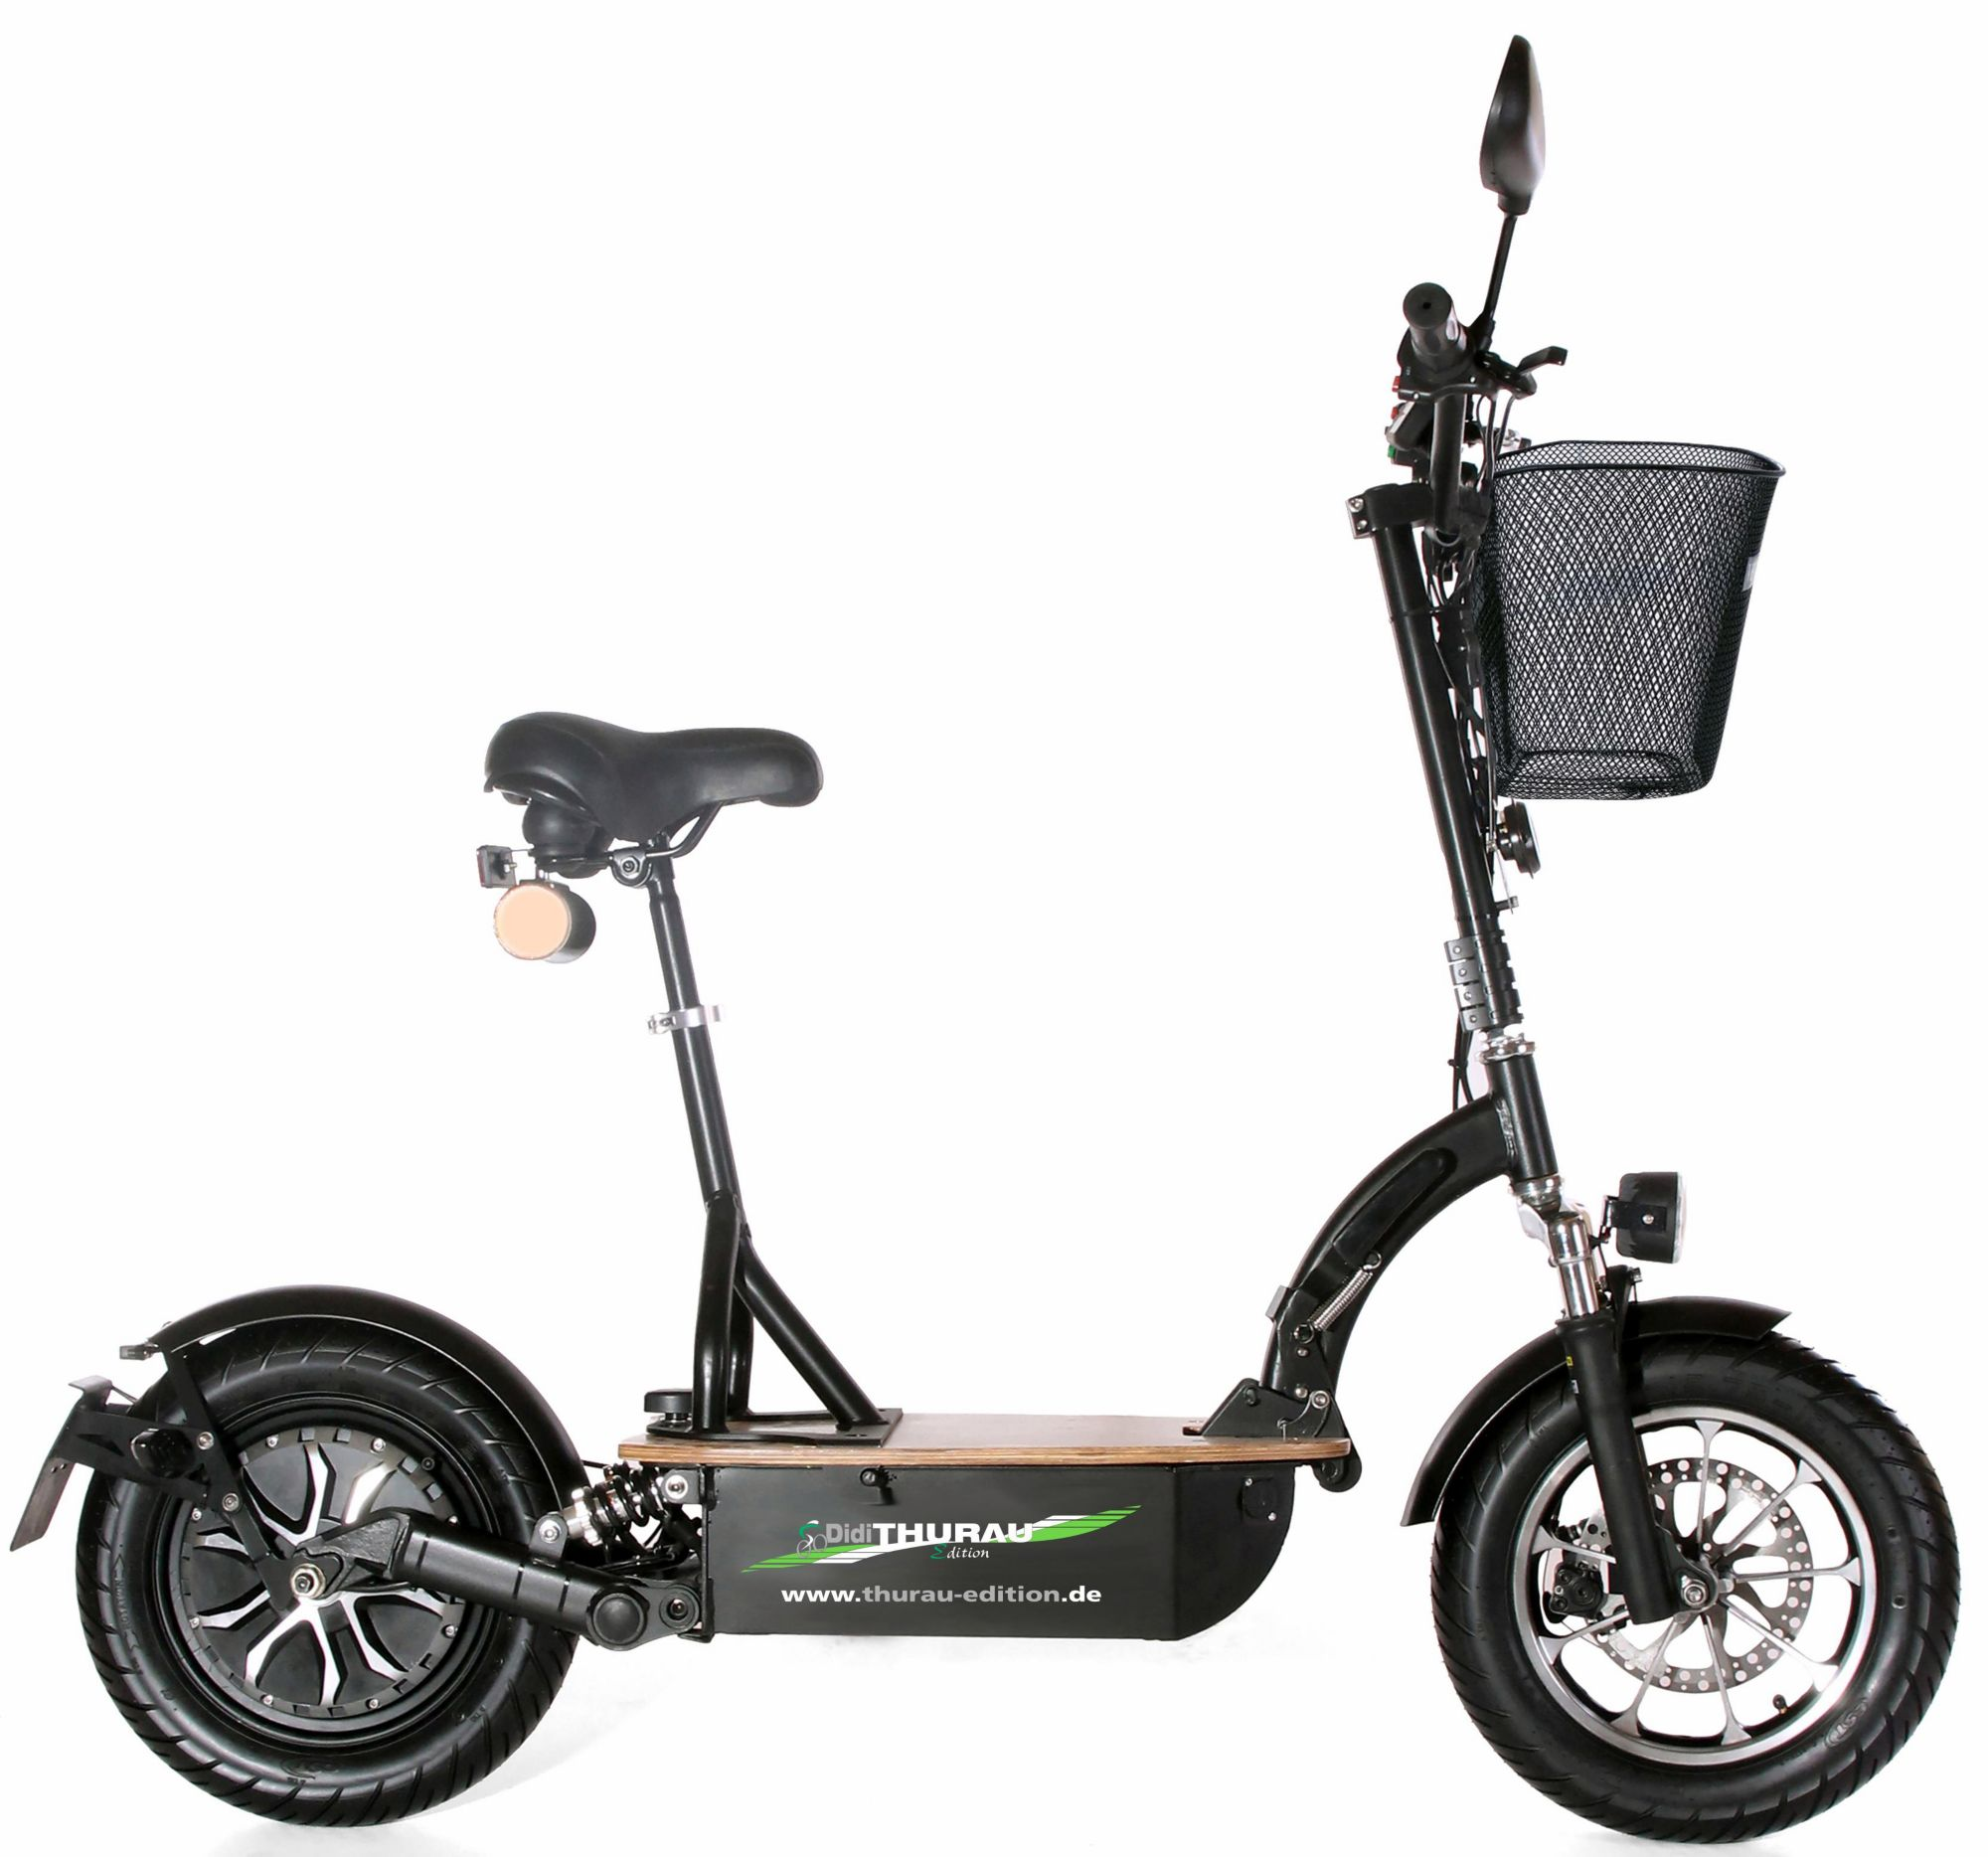 DIDI THURAU EDITION Didi Thurau Edition Elektro-Roller Eco-Tourer, 20 km/h, »Basic«